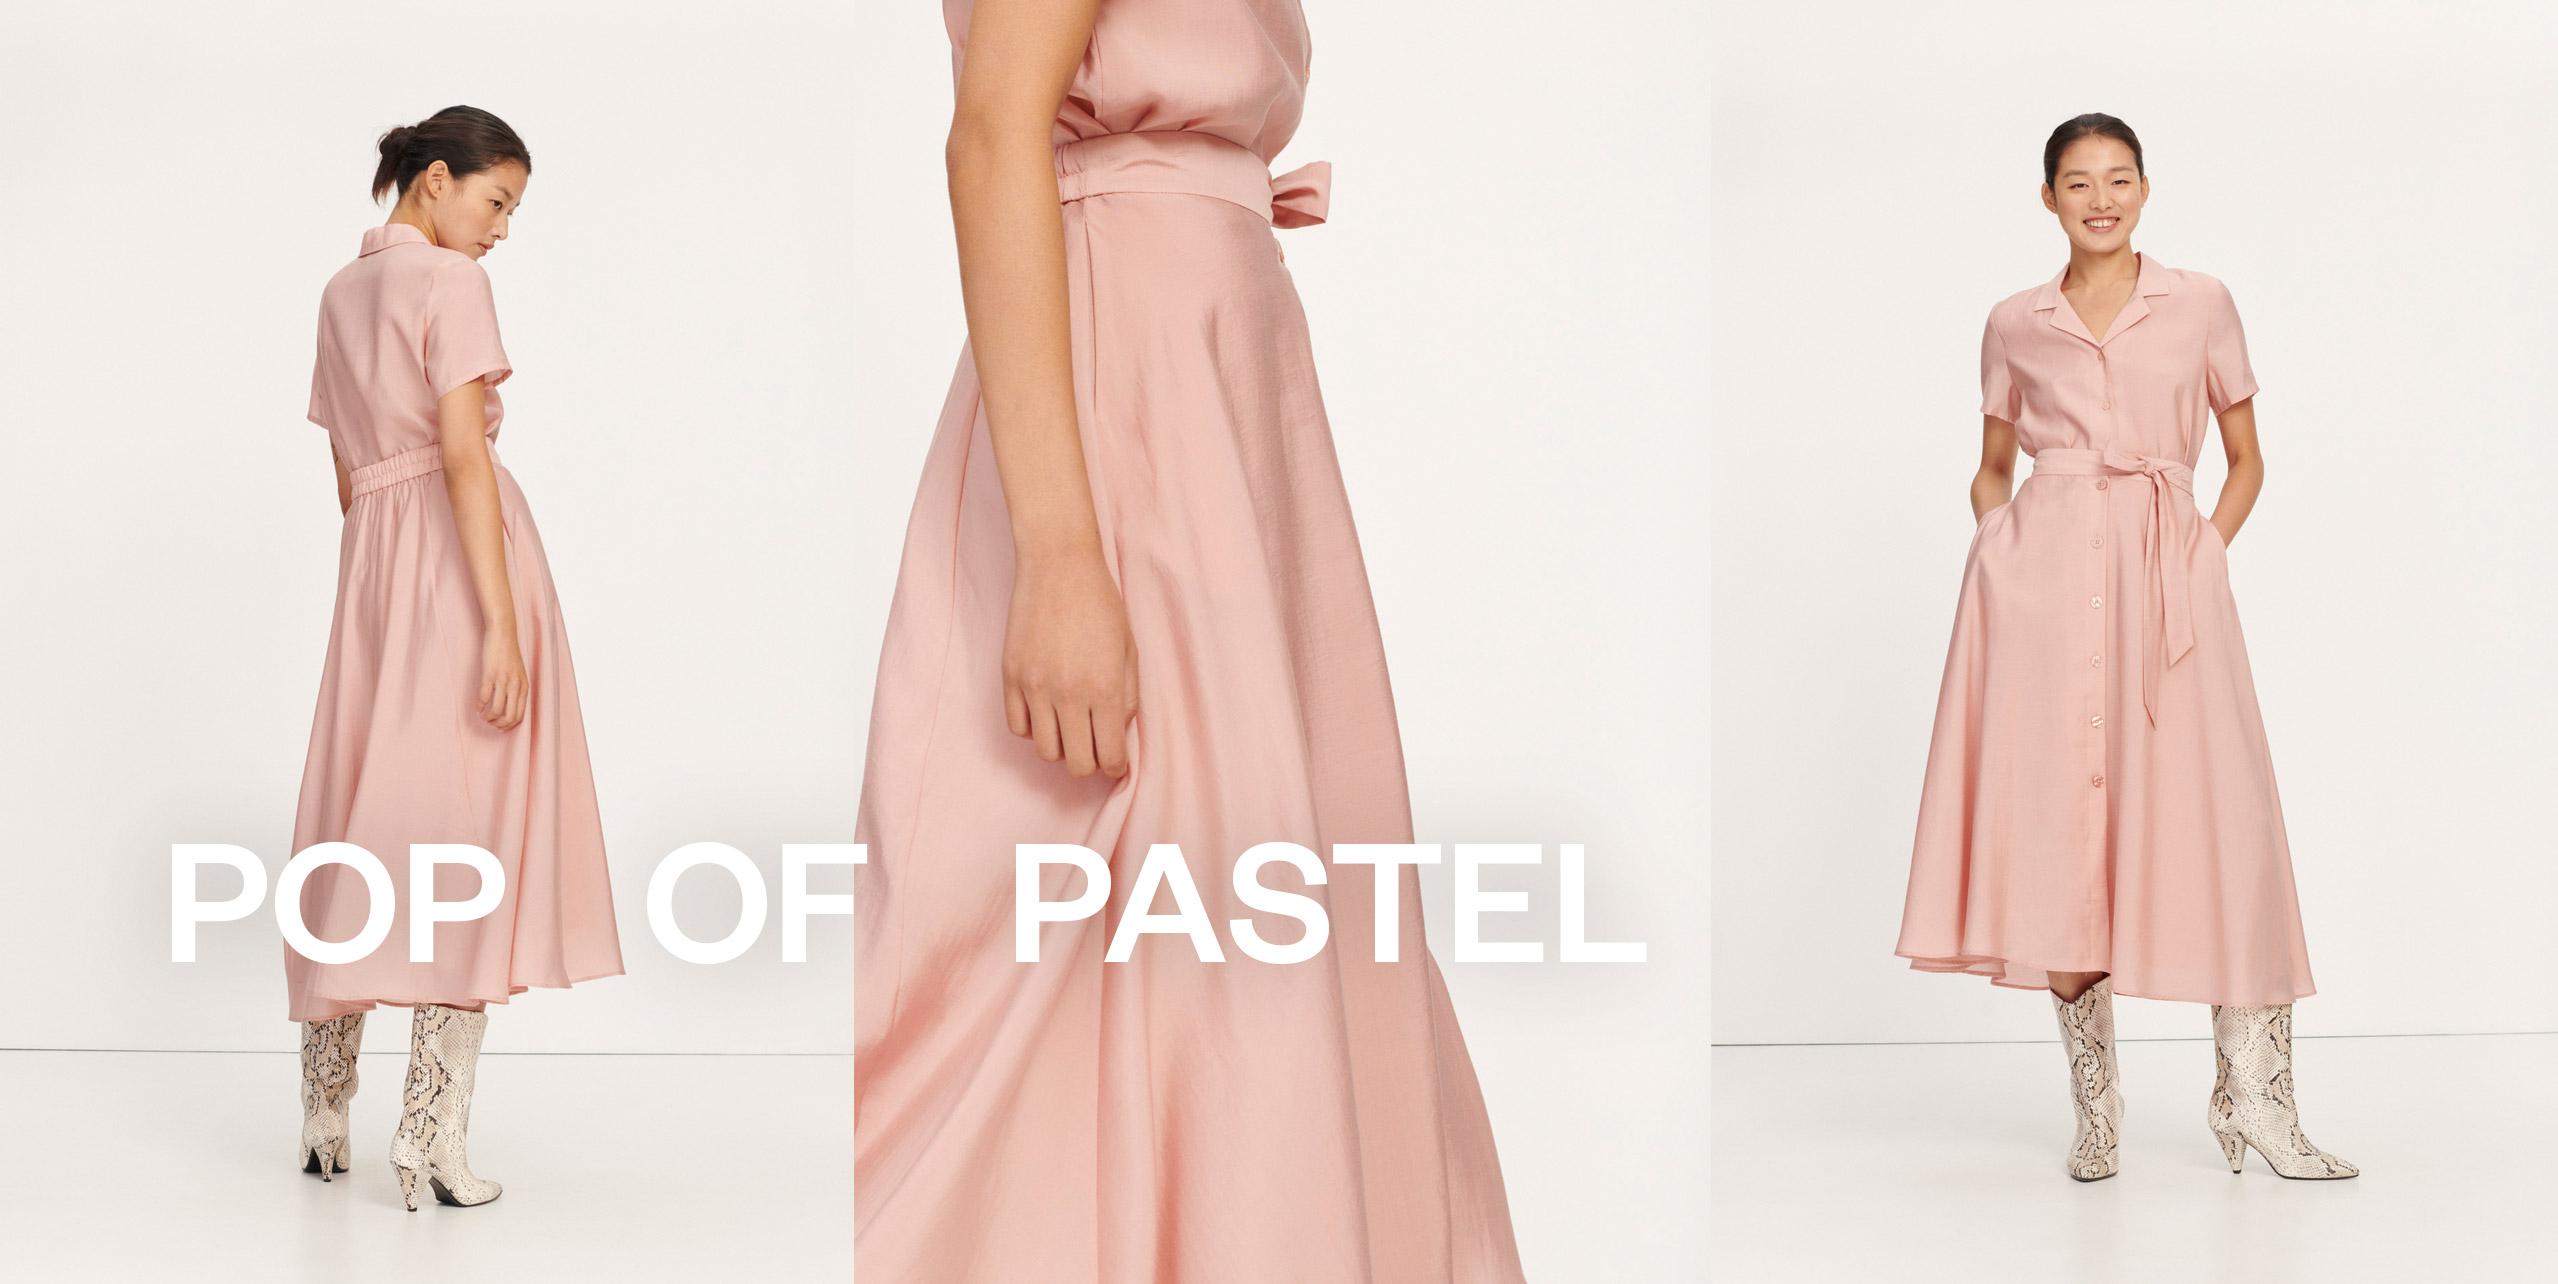 Ena p skirt 11465 Women's fashion